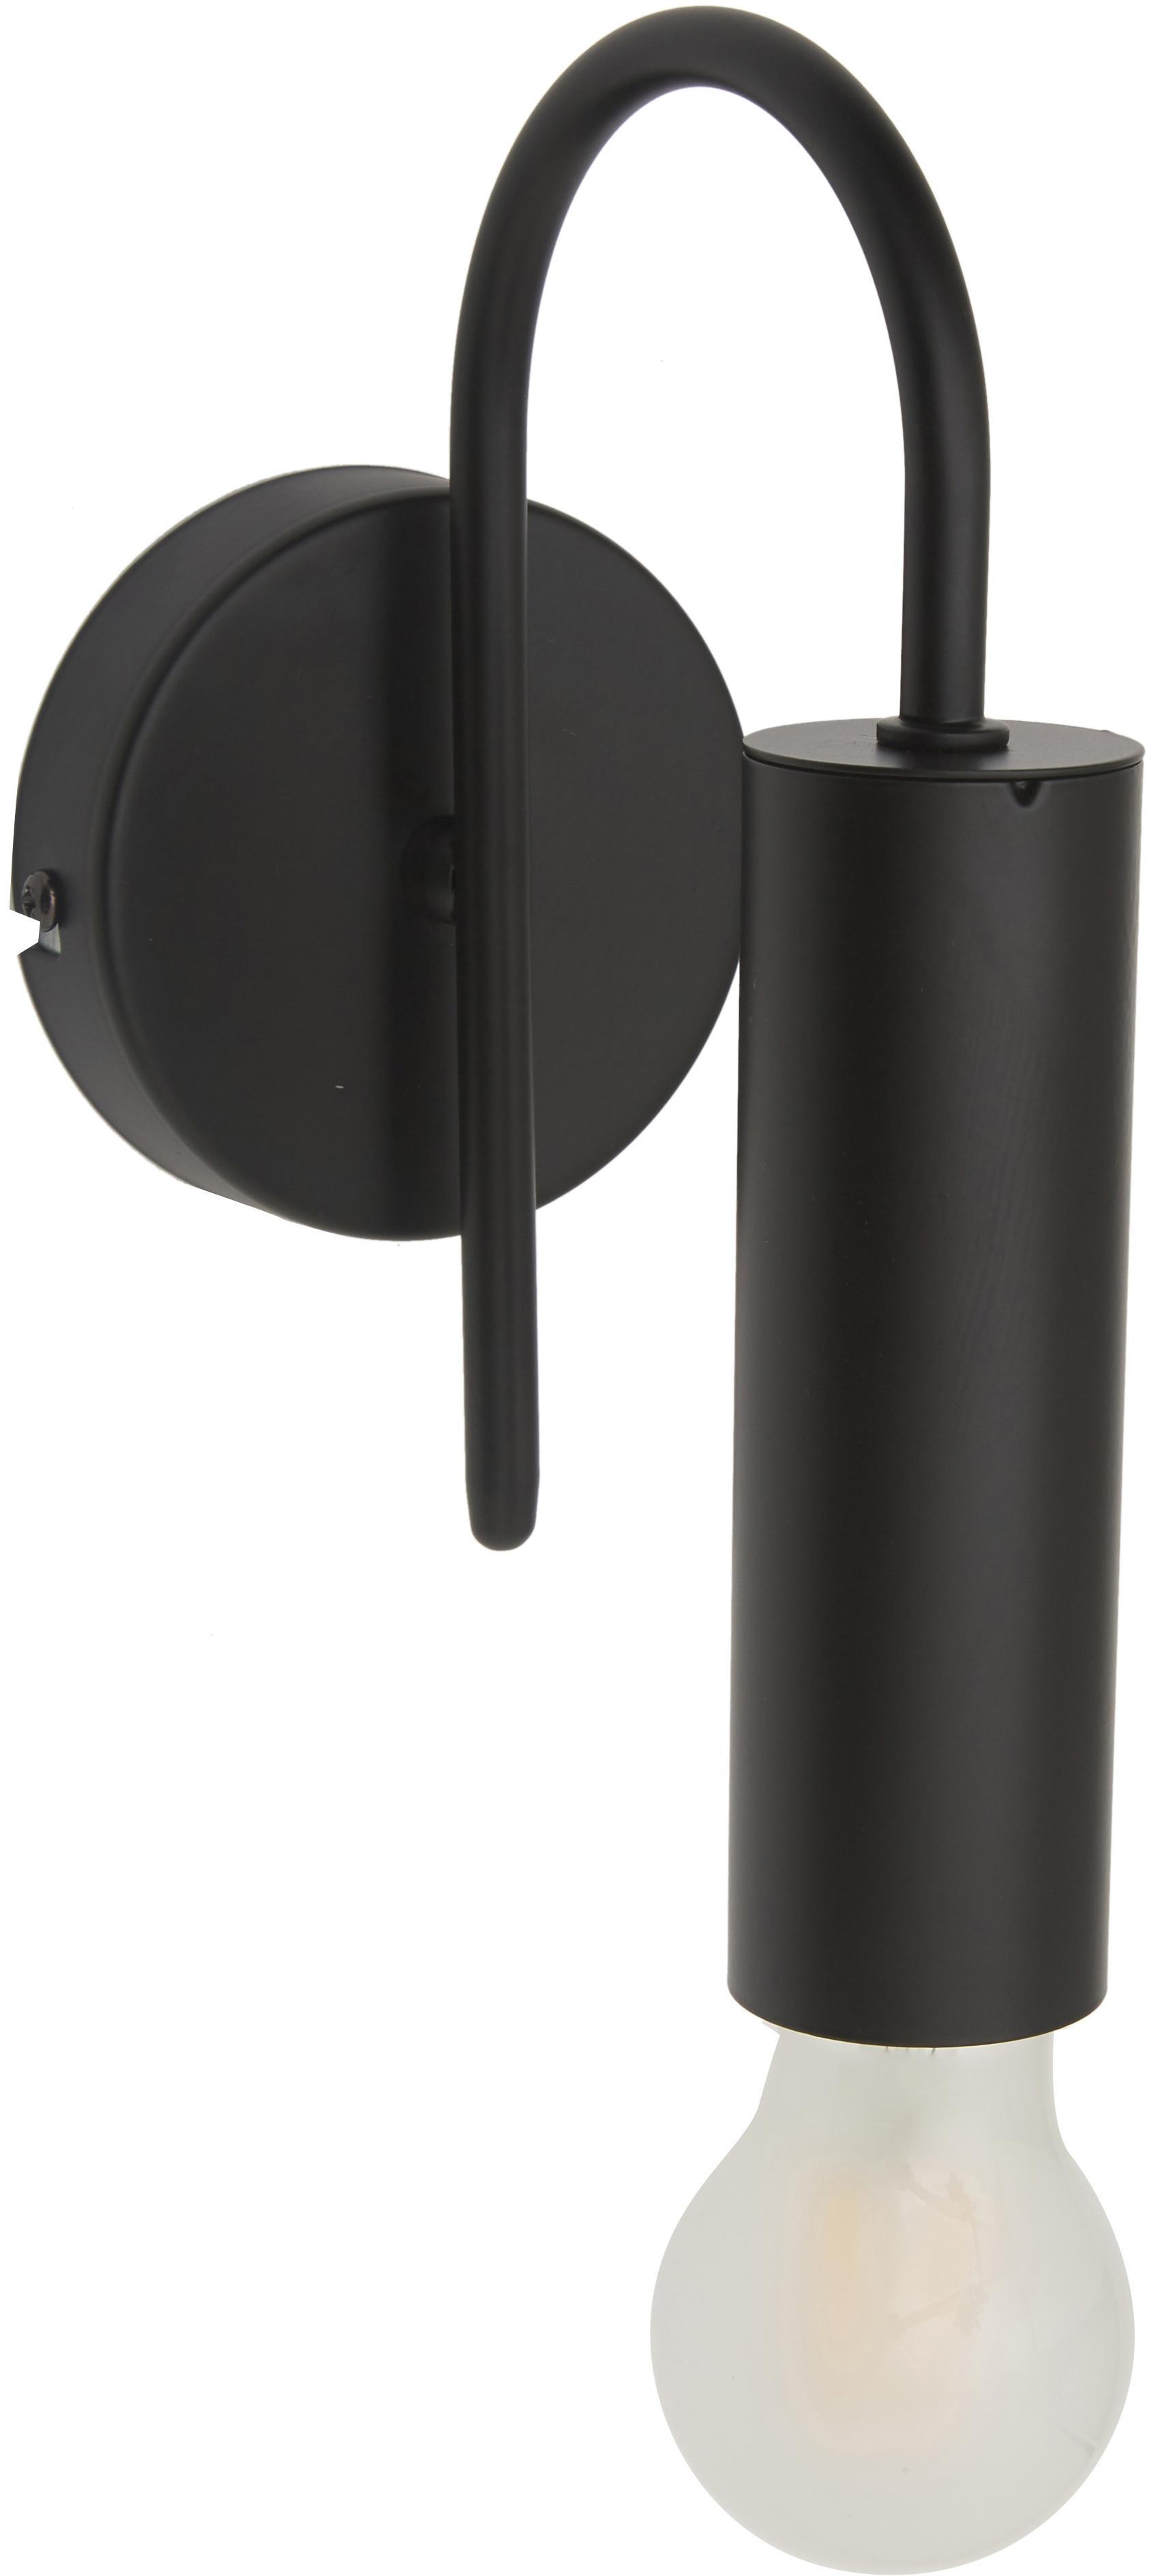 Wandleuchte Loppe, Metall, lackiert, Schwarz, 10 x 21 cm